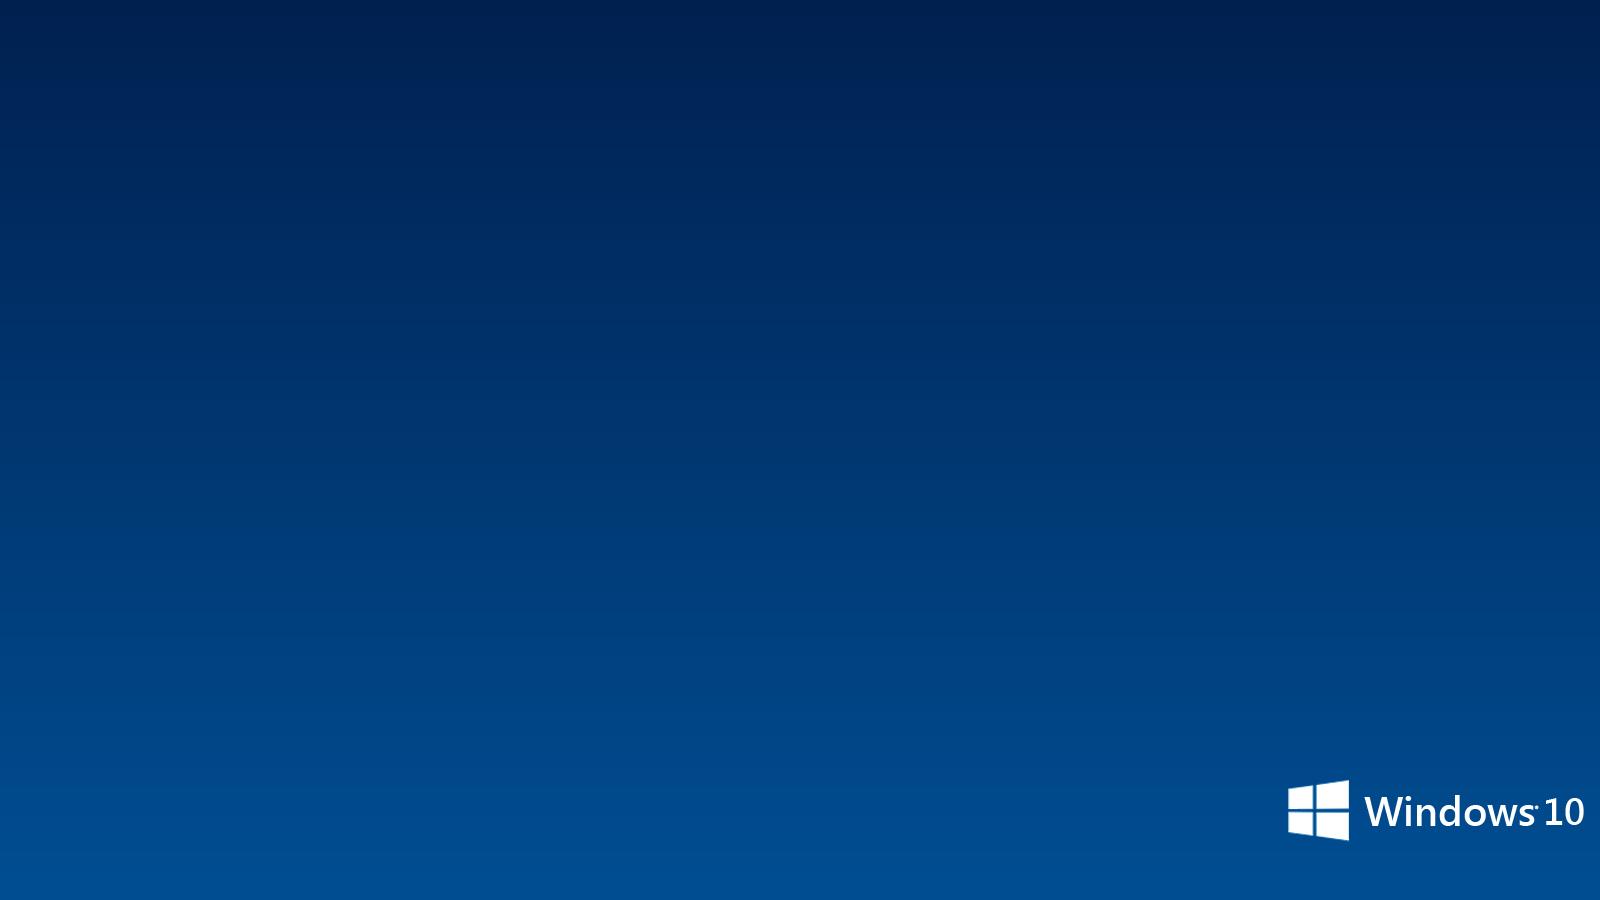 Wallpaper download for windows 10 - Blue Windows 10 Wallpaper Pc 9524 Wallpaper High Resolution